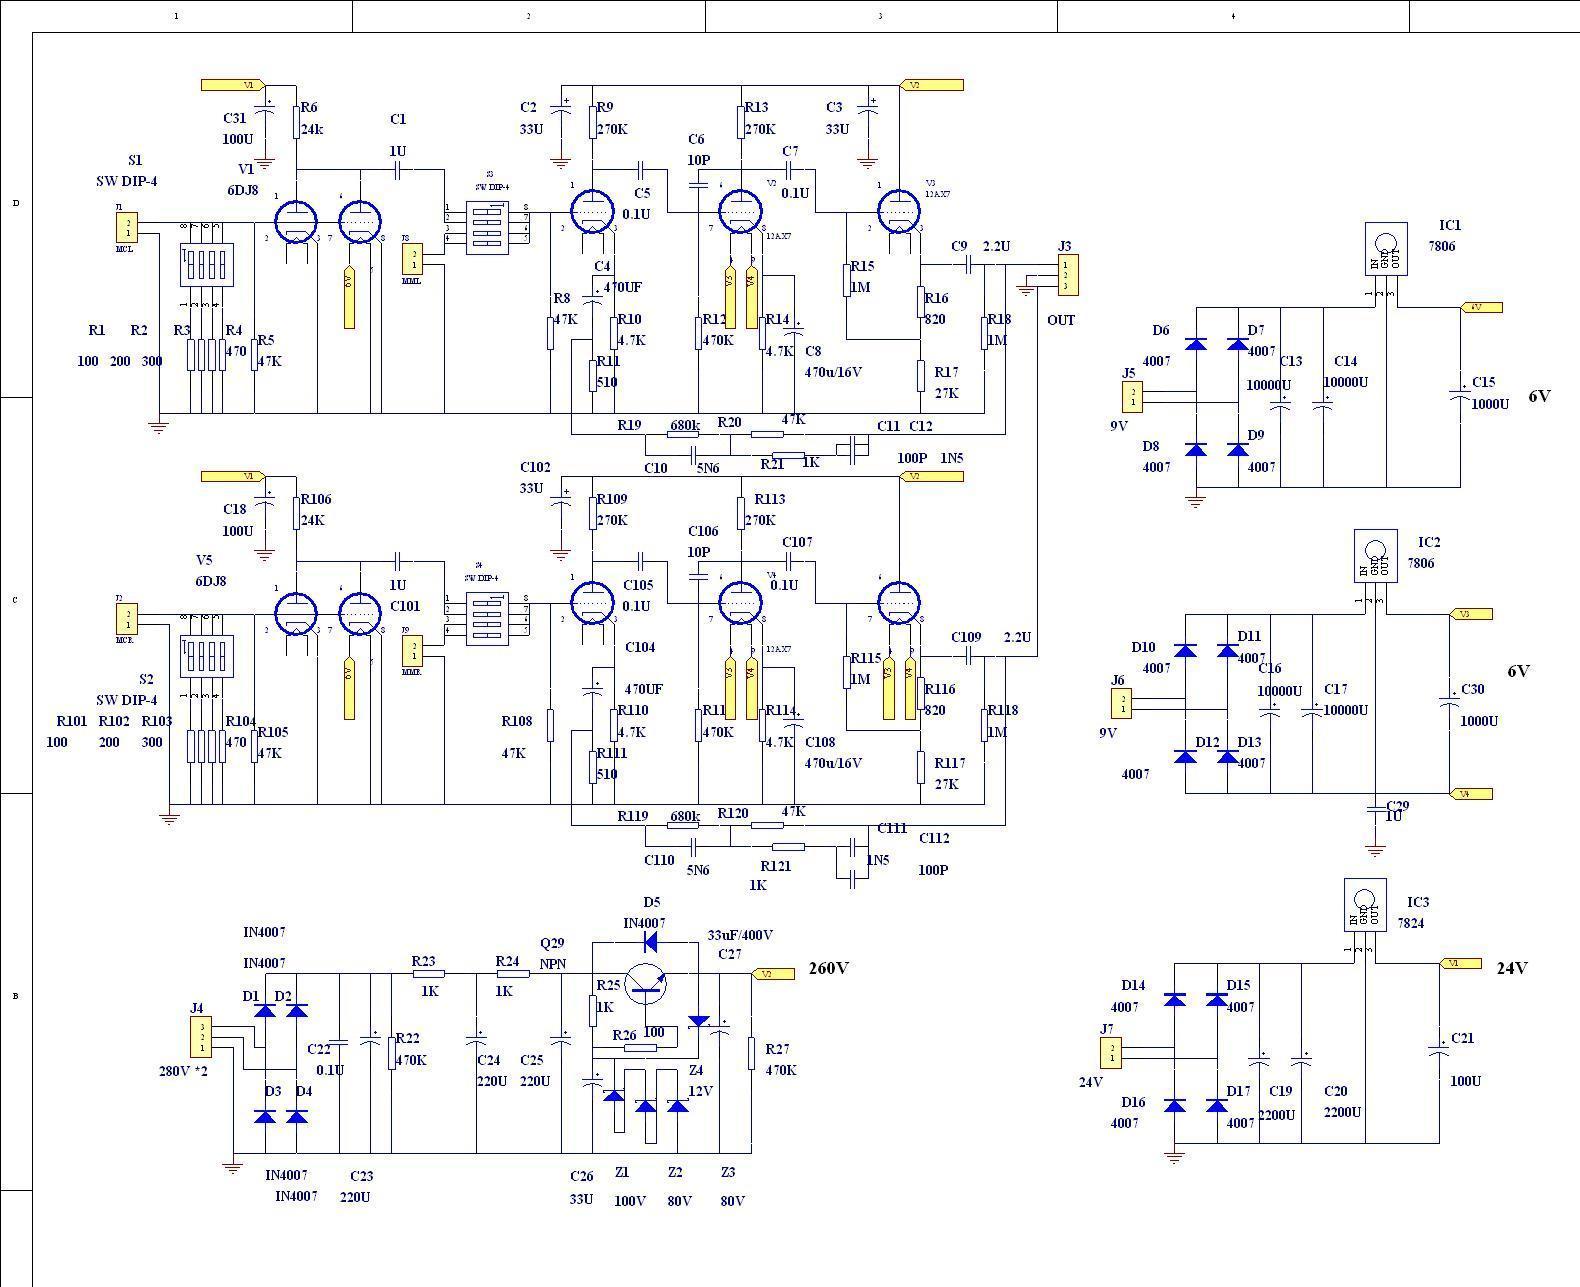 mm mc phono amplifier bare pcb circuit base on marantz 7 in amplifier from [ 1580 x 1287 Pixel ]